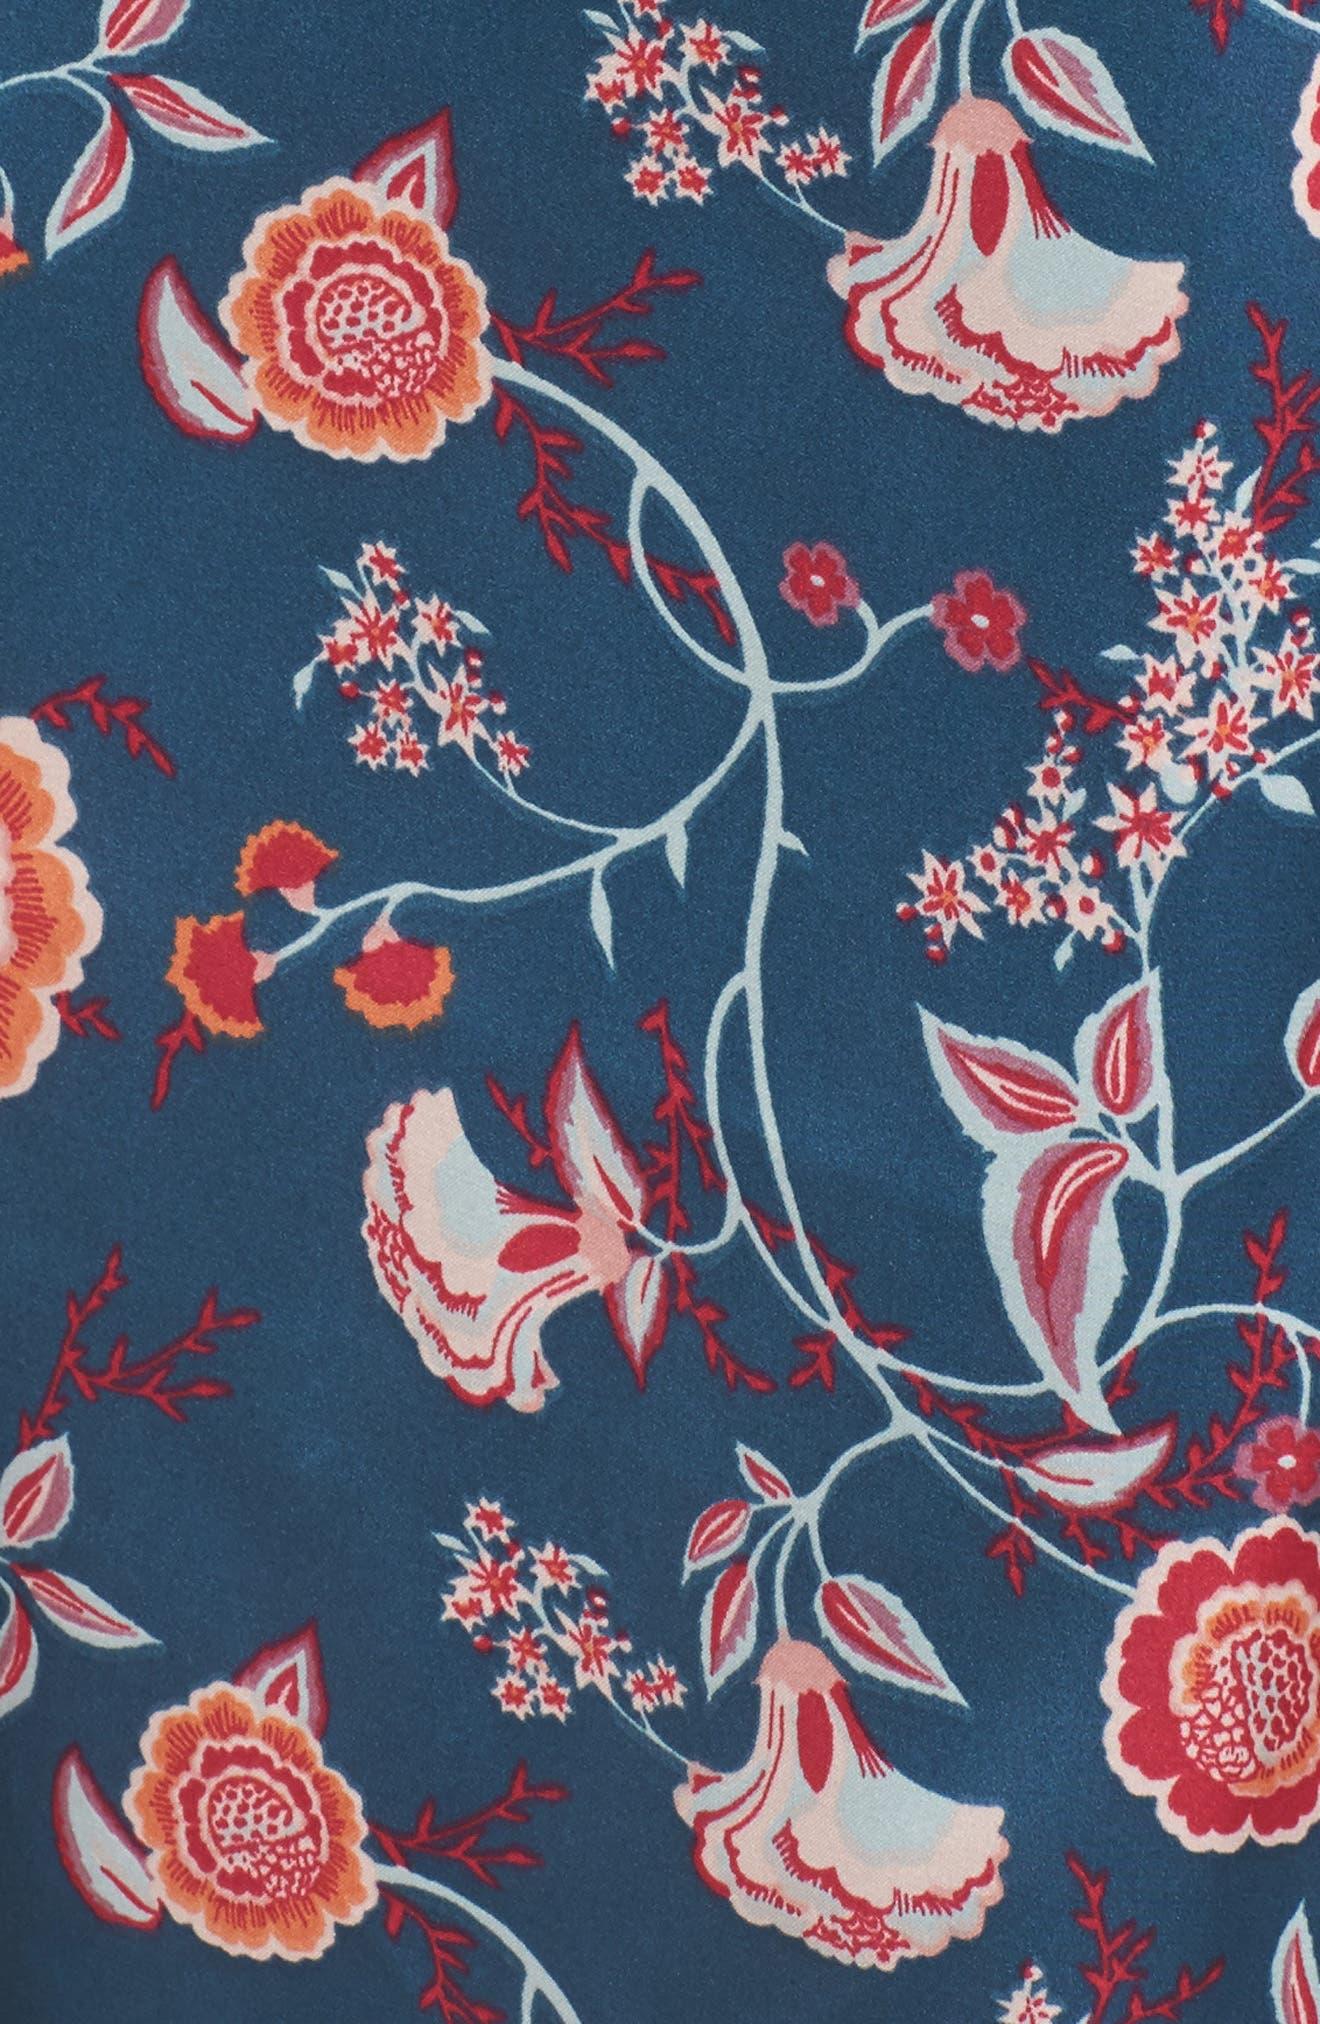 Floral Print Satin Kimono,                             Alternate thumbnail 6, color,                             Blue Ceramic Vintage Floral